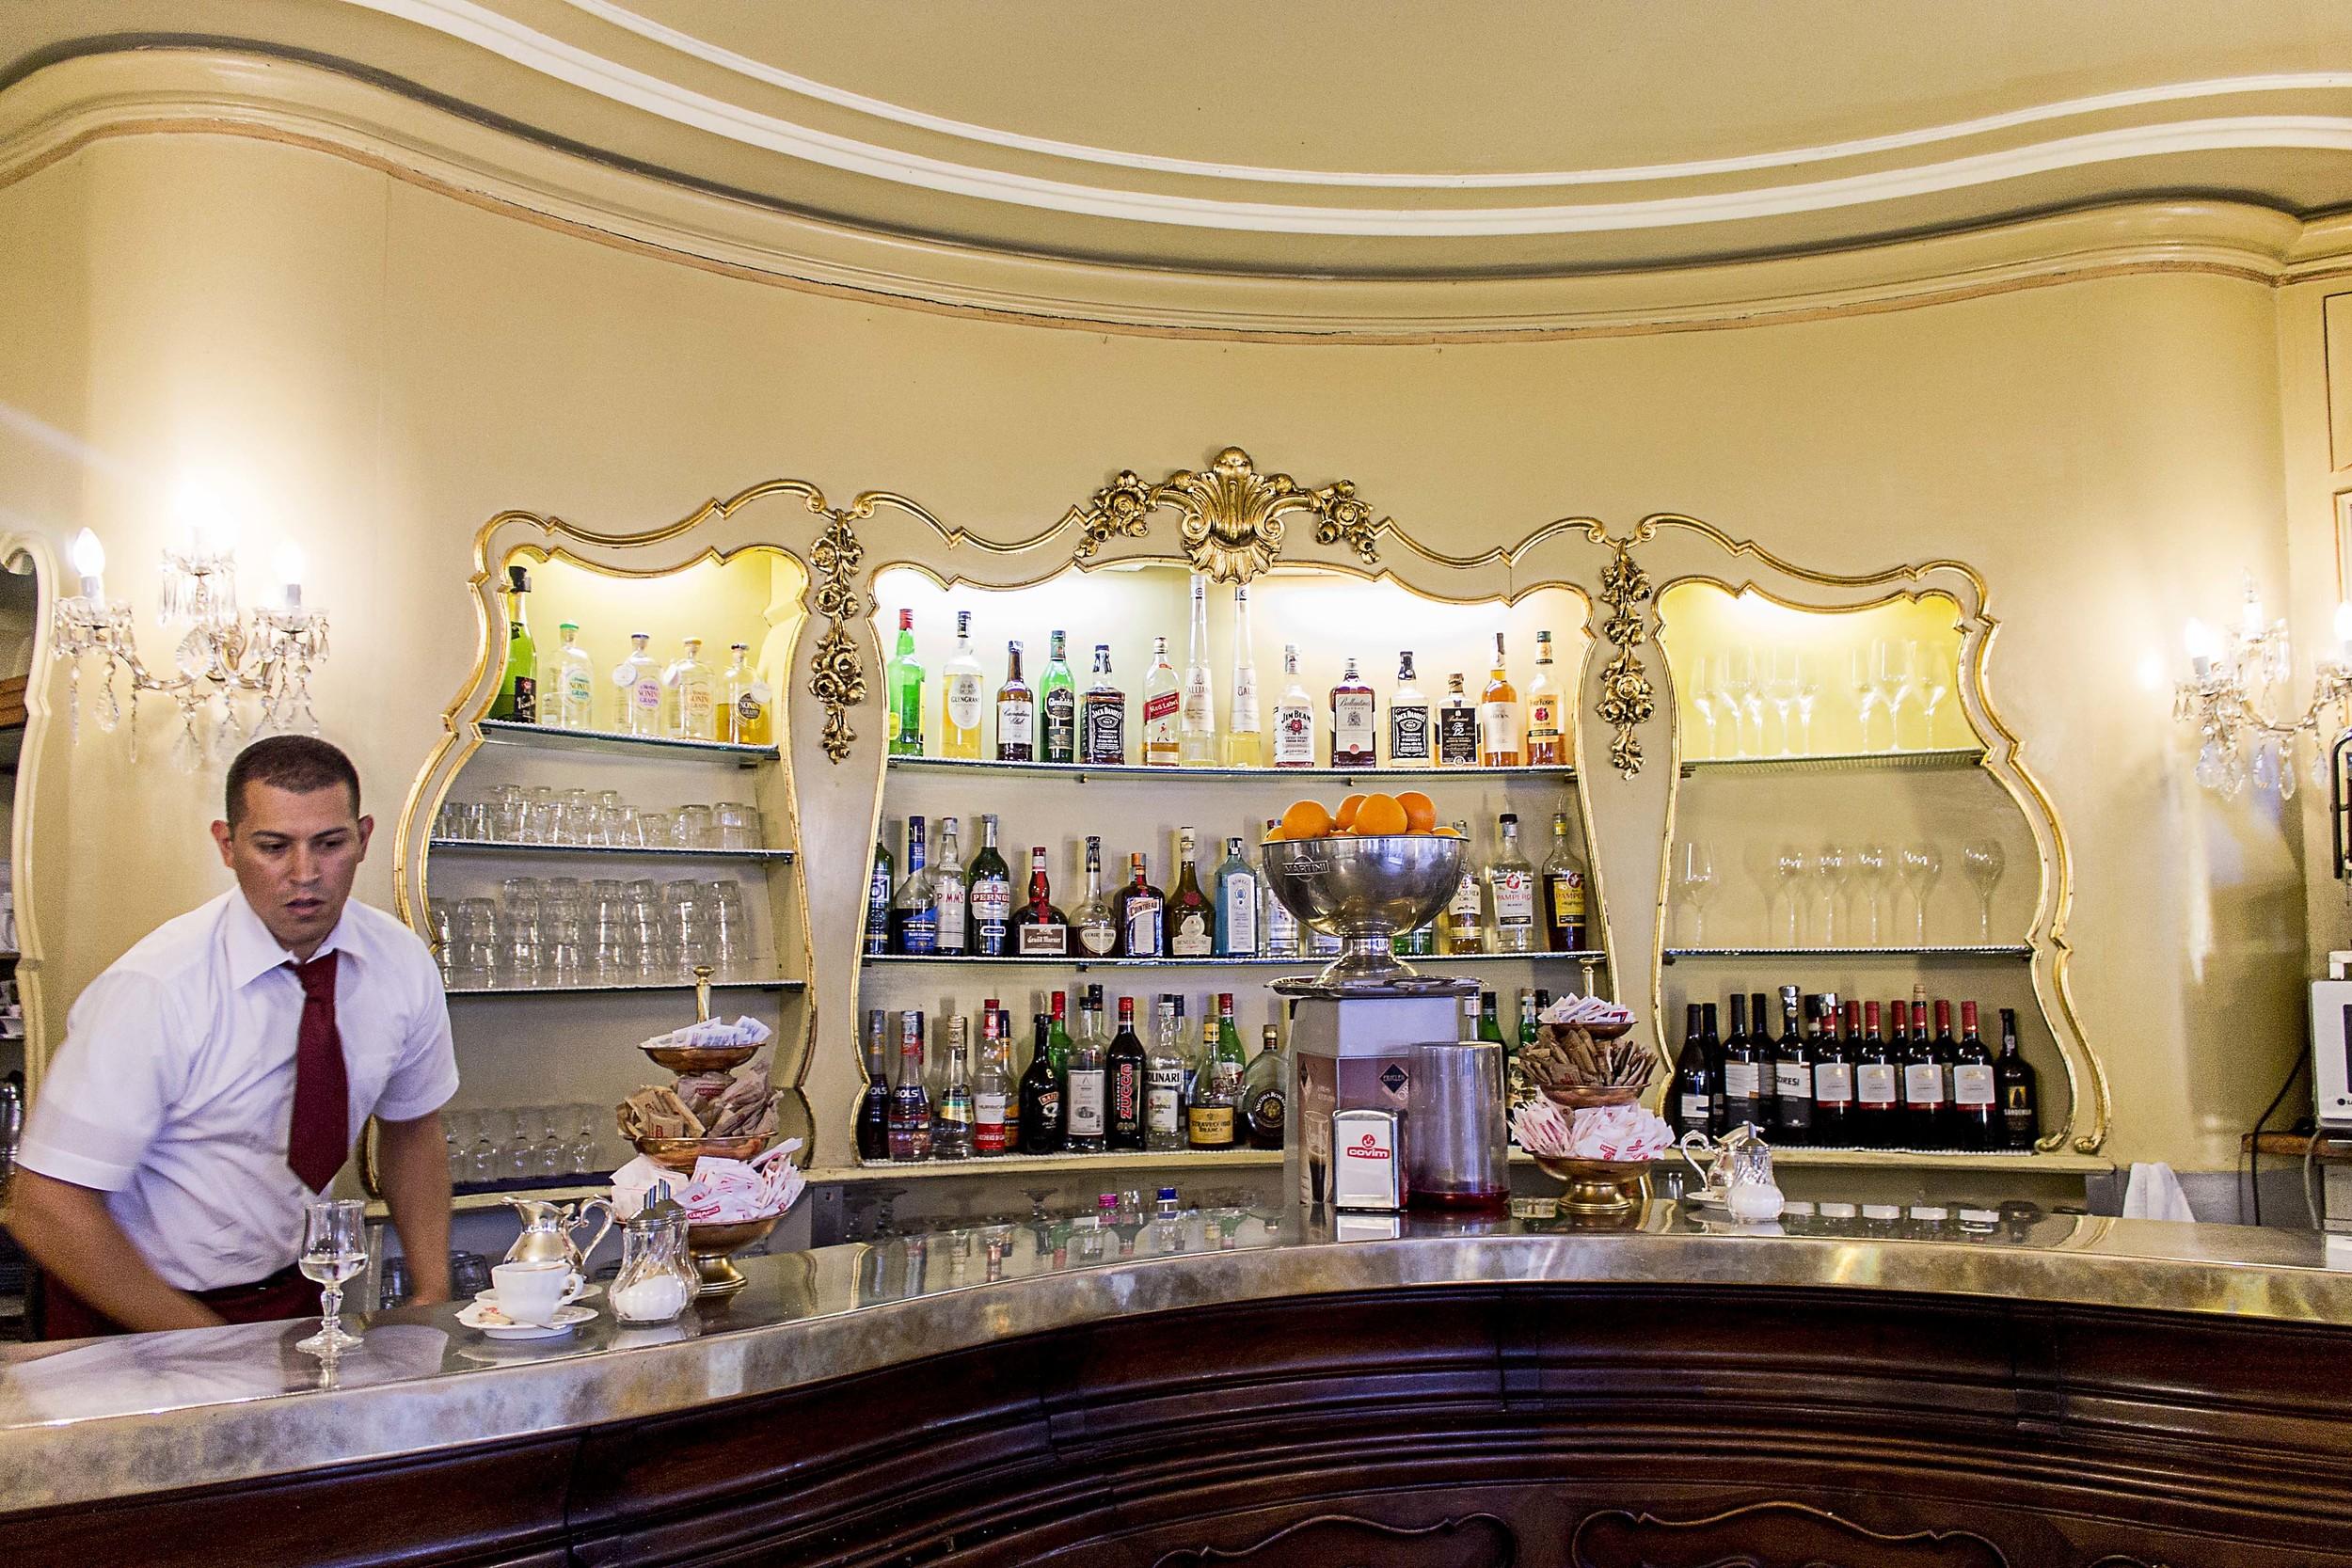 The beautiful and quite stunning interior of the bar of Klainguti's.